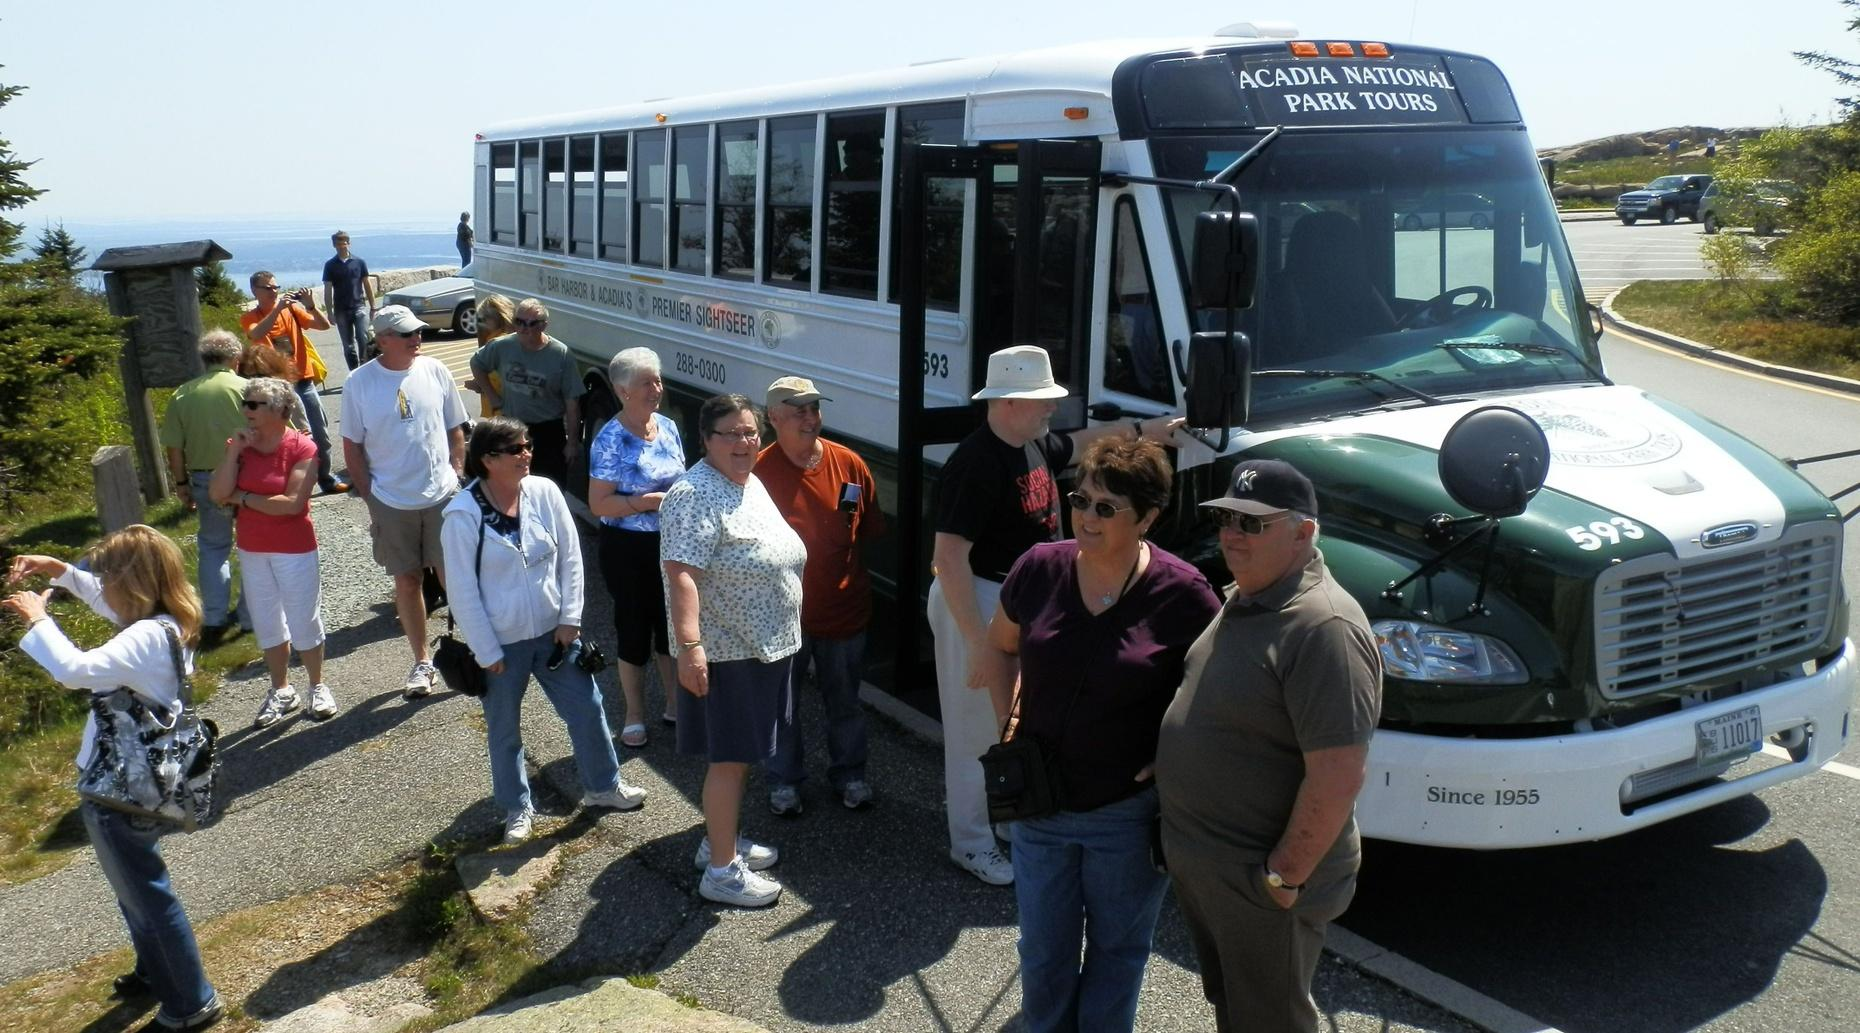 Bus Tour of Acadia National Park